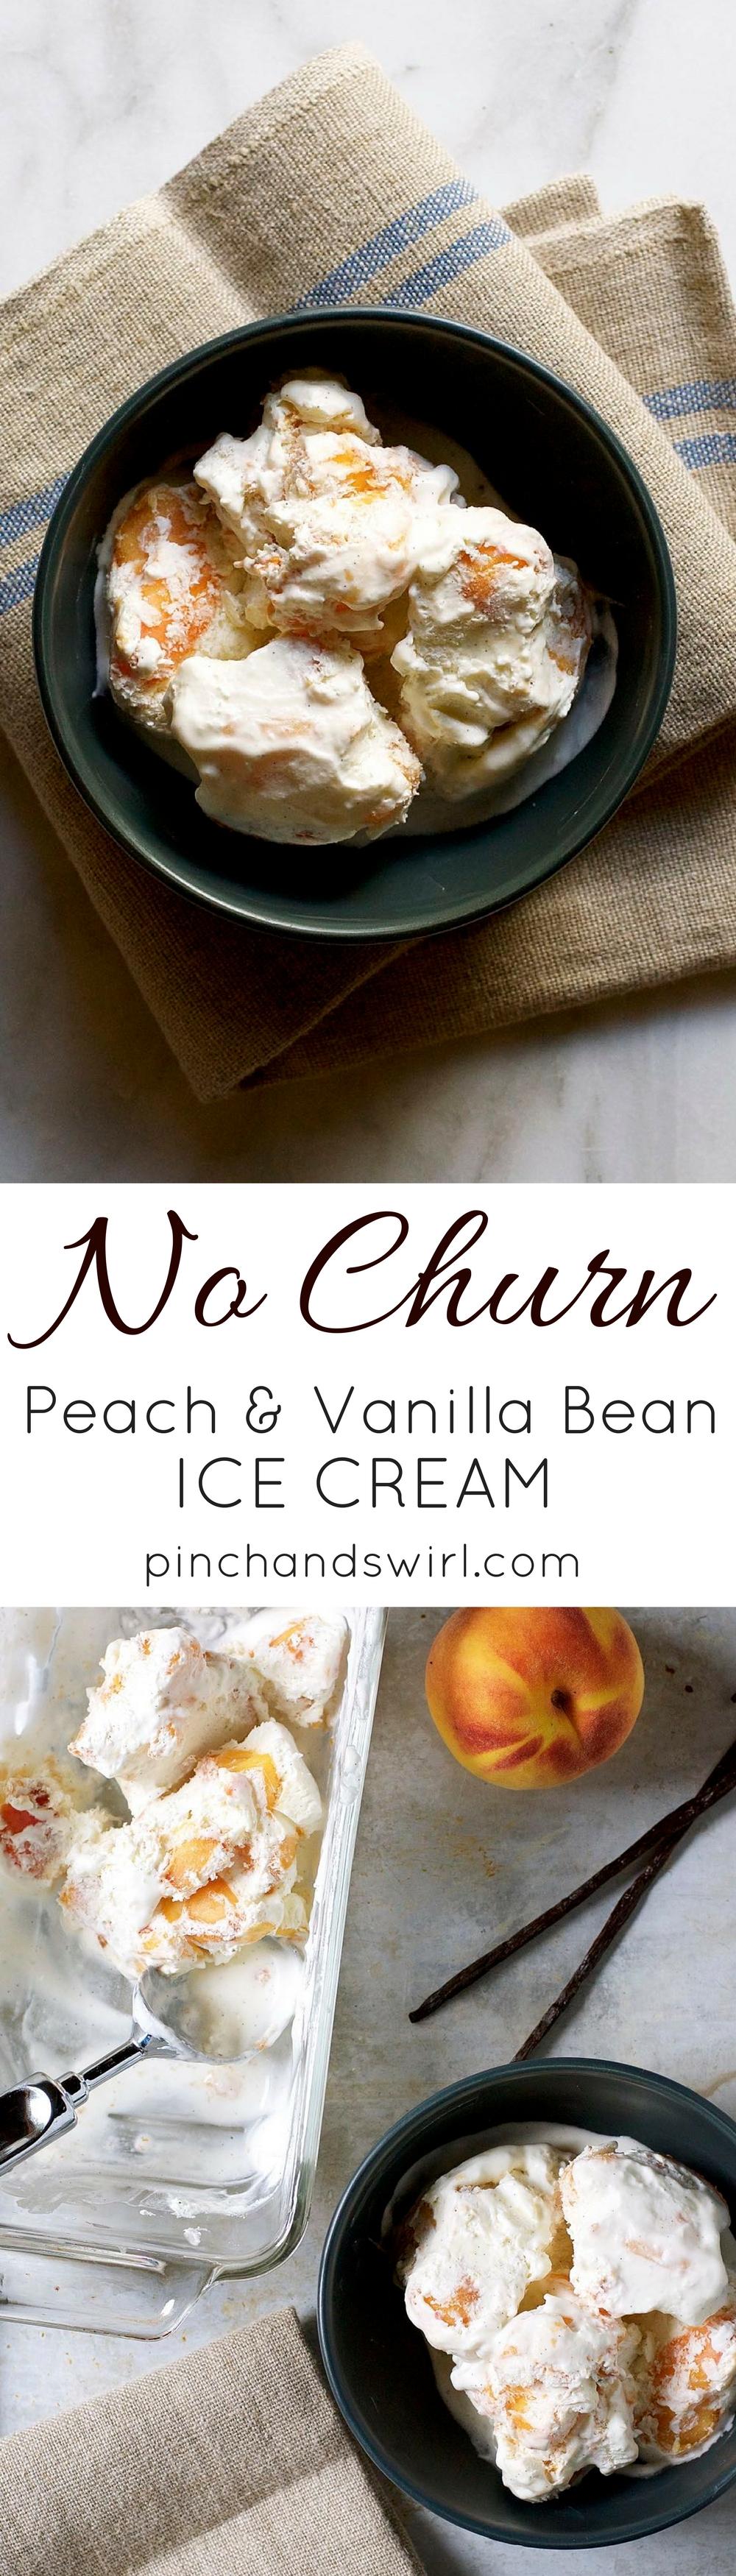 Homemade No Churn Peach Vanilla Bean Ice Cream - the quintessential summer dessert made easy! #icecream #peaches #easyrecipes #homemadeicecream